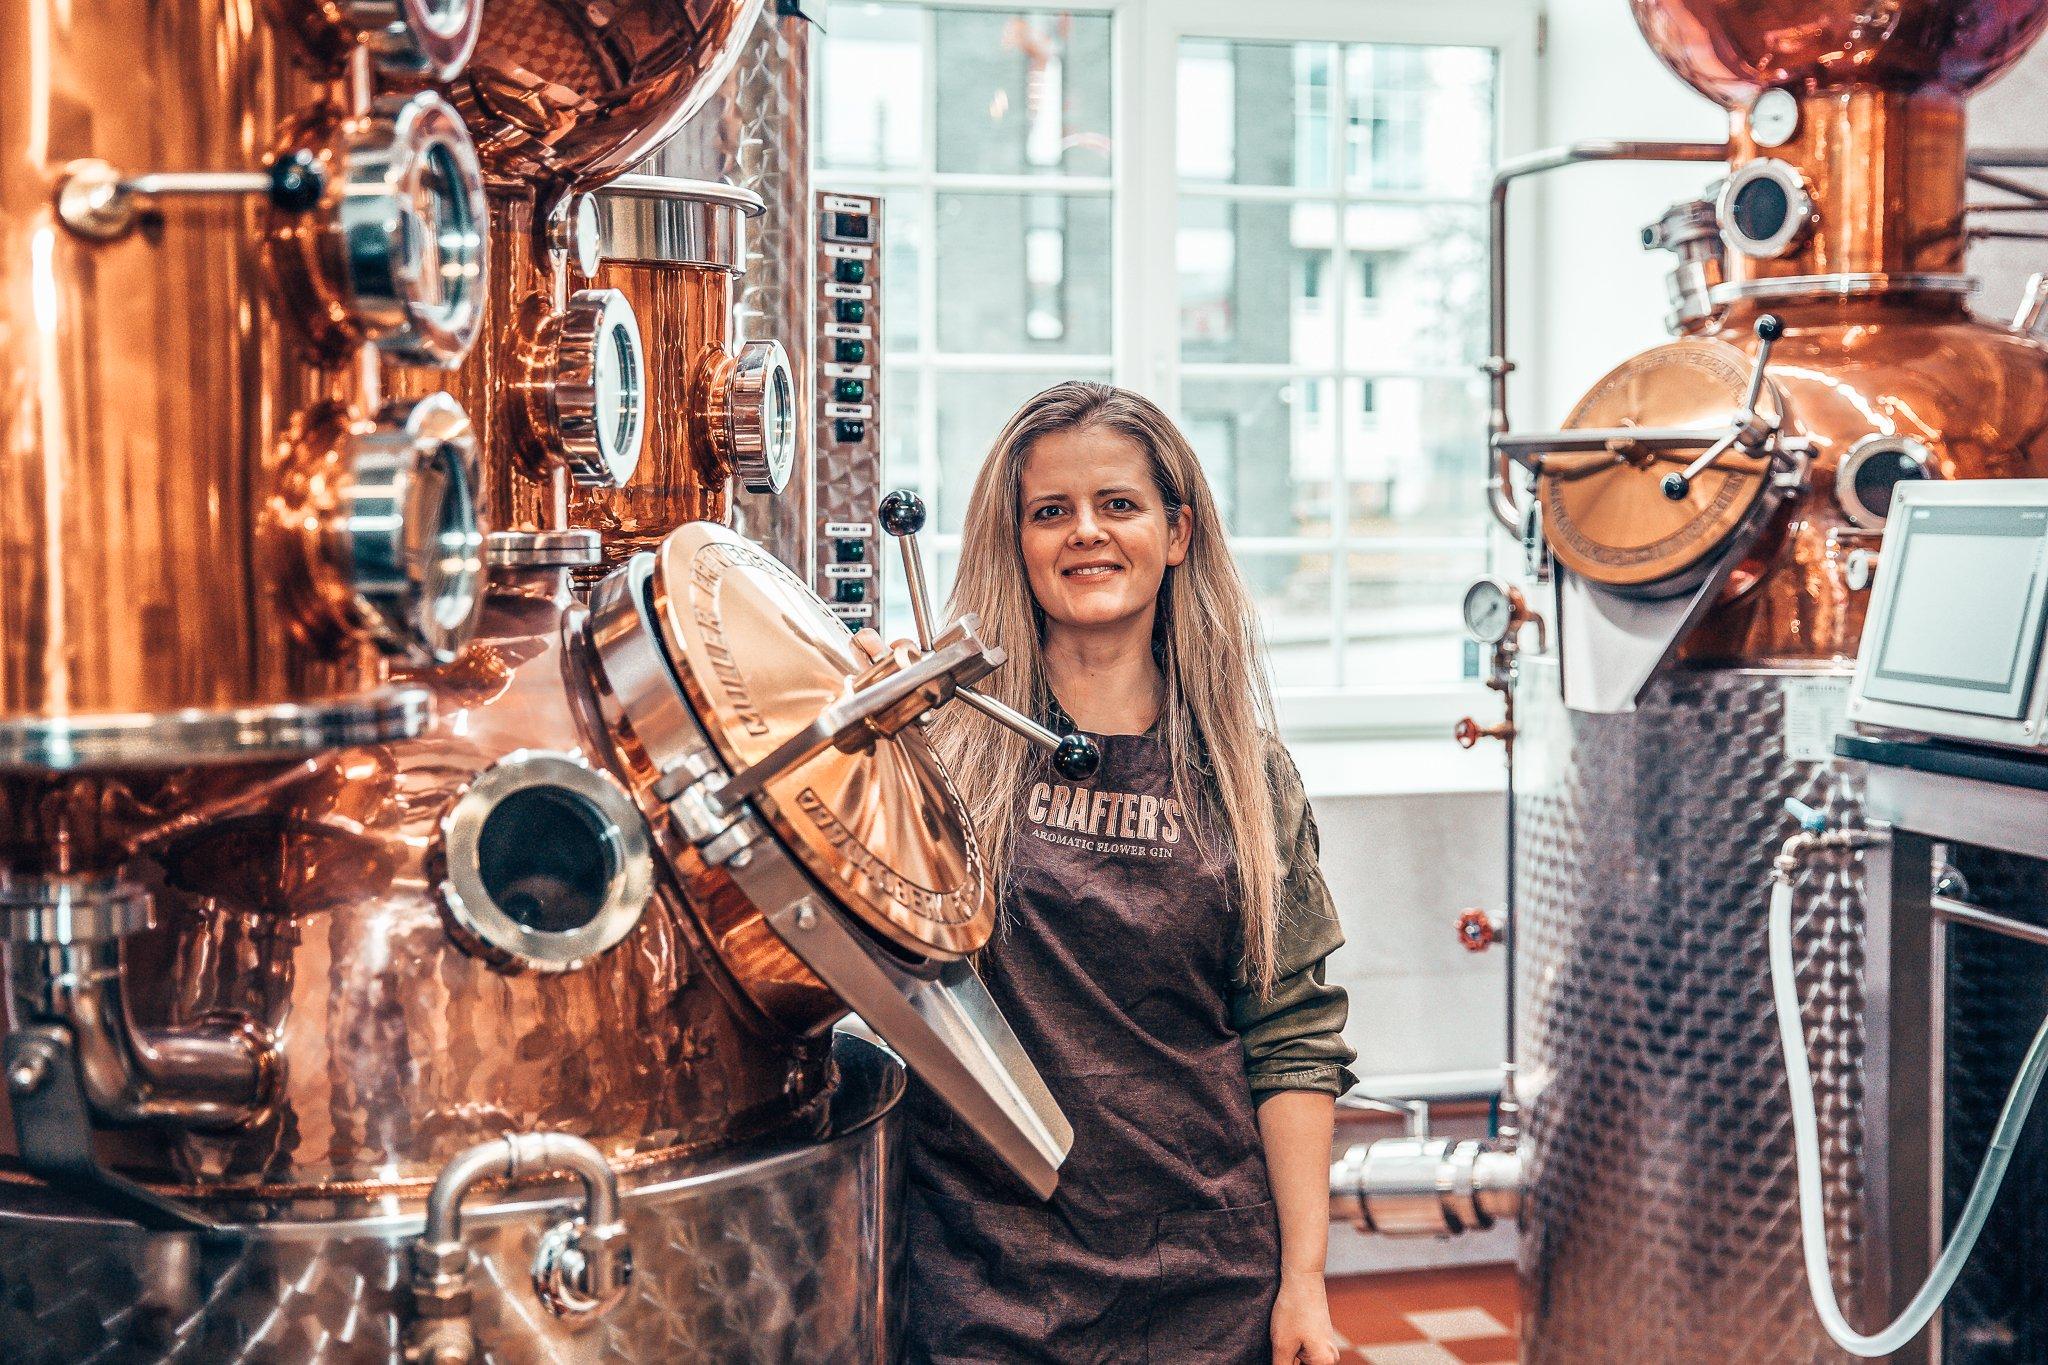 Hanna Kaur, Master Distiller Crafter's Gin, Estland, Alles over gin.